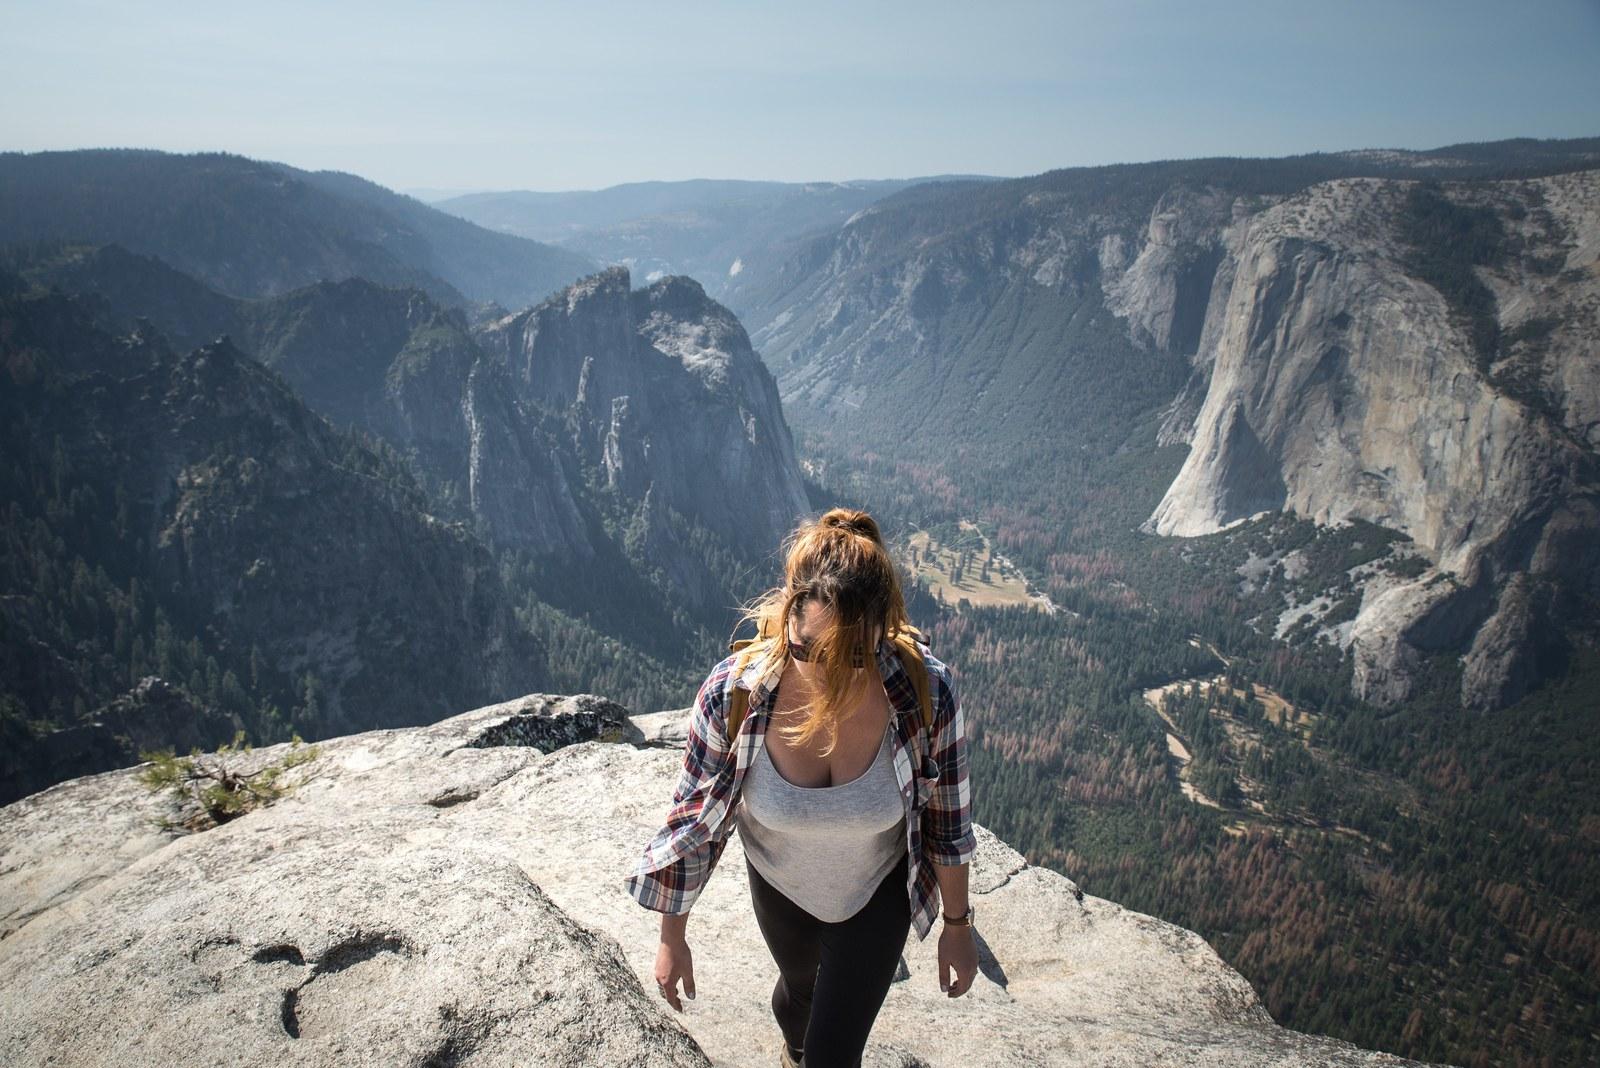 Manue à Yosemite NP Yosemite